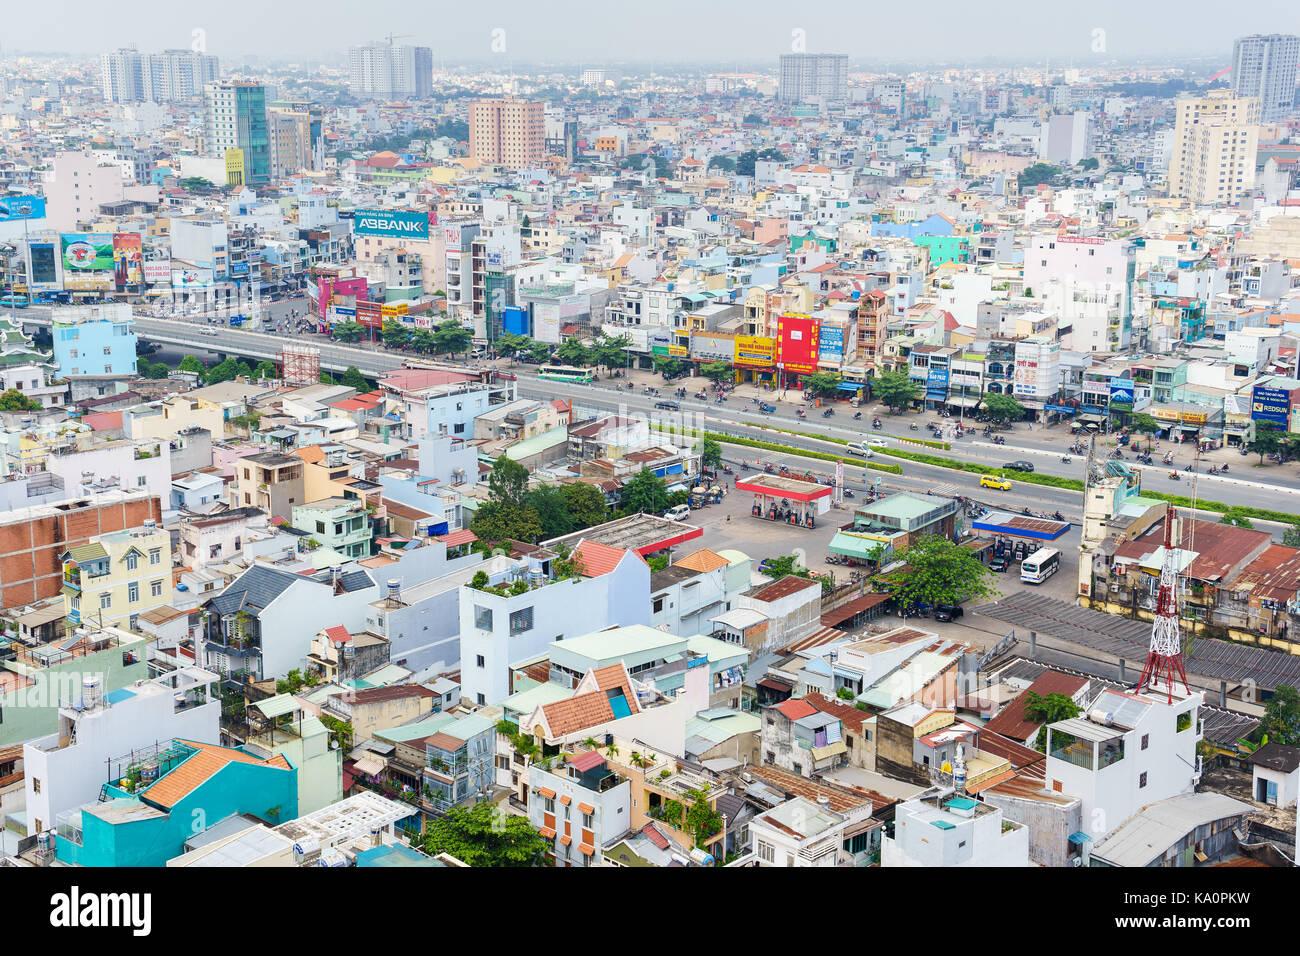 Ho Chi Minh city (or Saigon) skyline with colorful house, Vietnam. Saigon is the biggest city and economic center - Stock Image